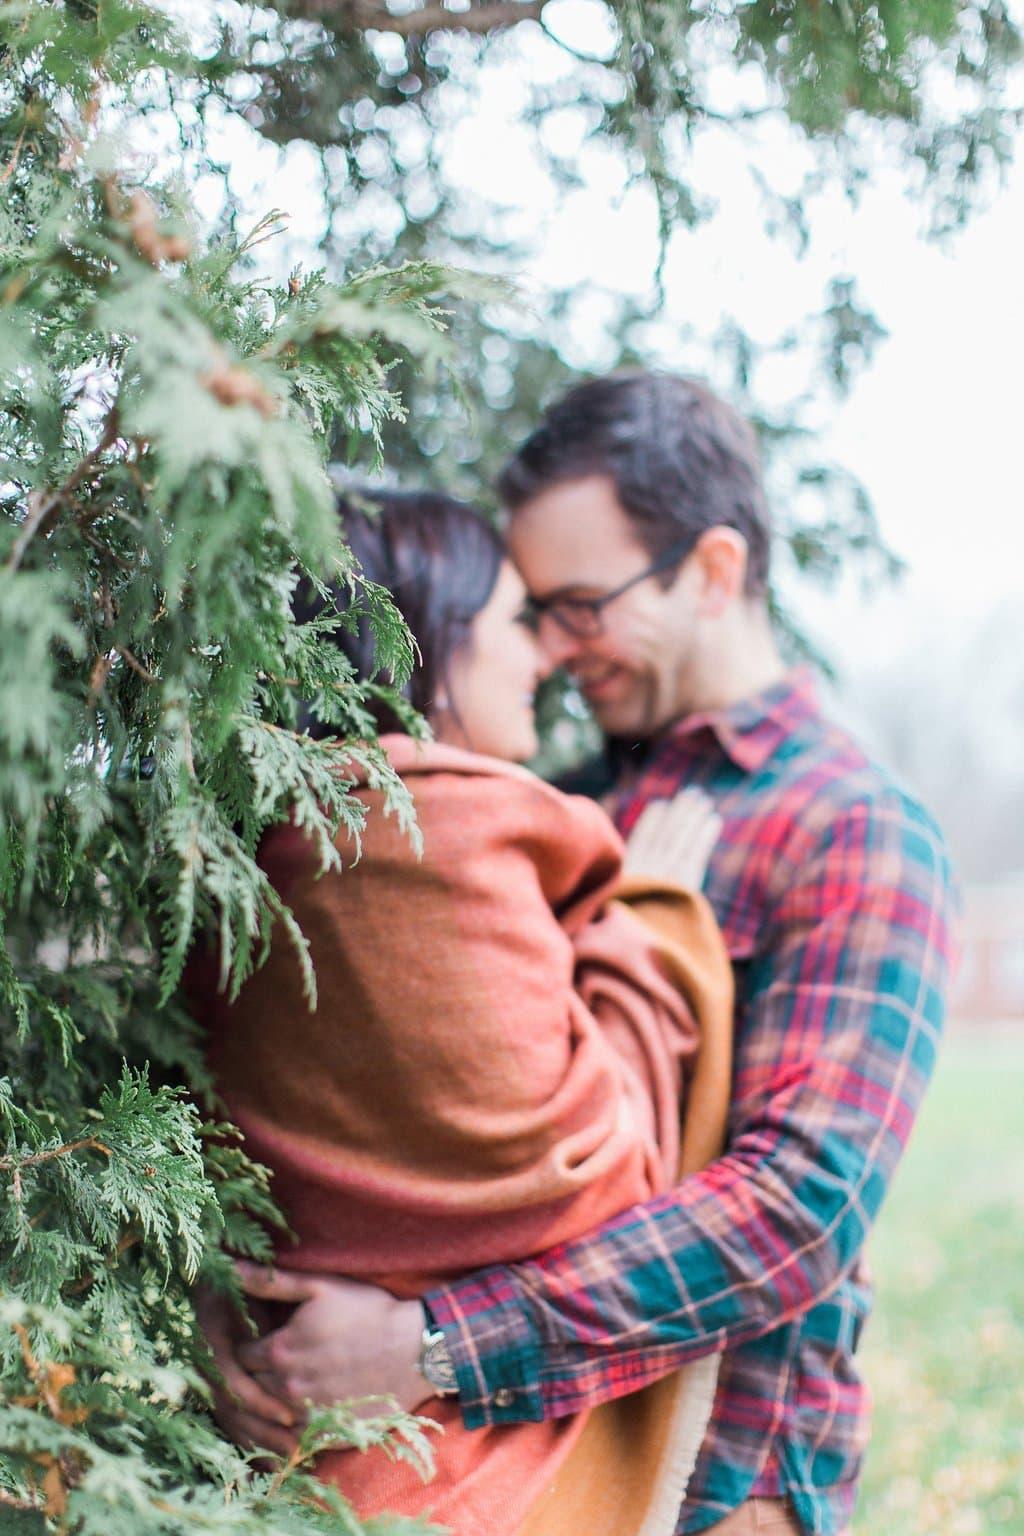 Couple snuggling near evergreen bushes